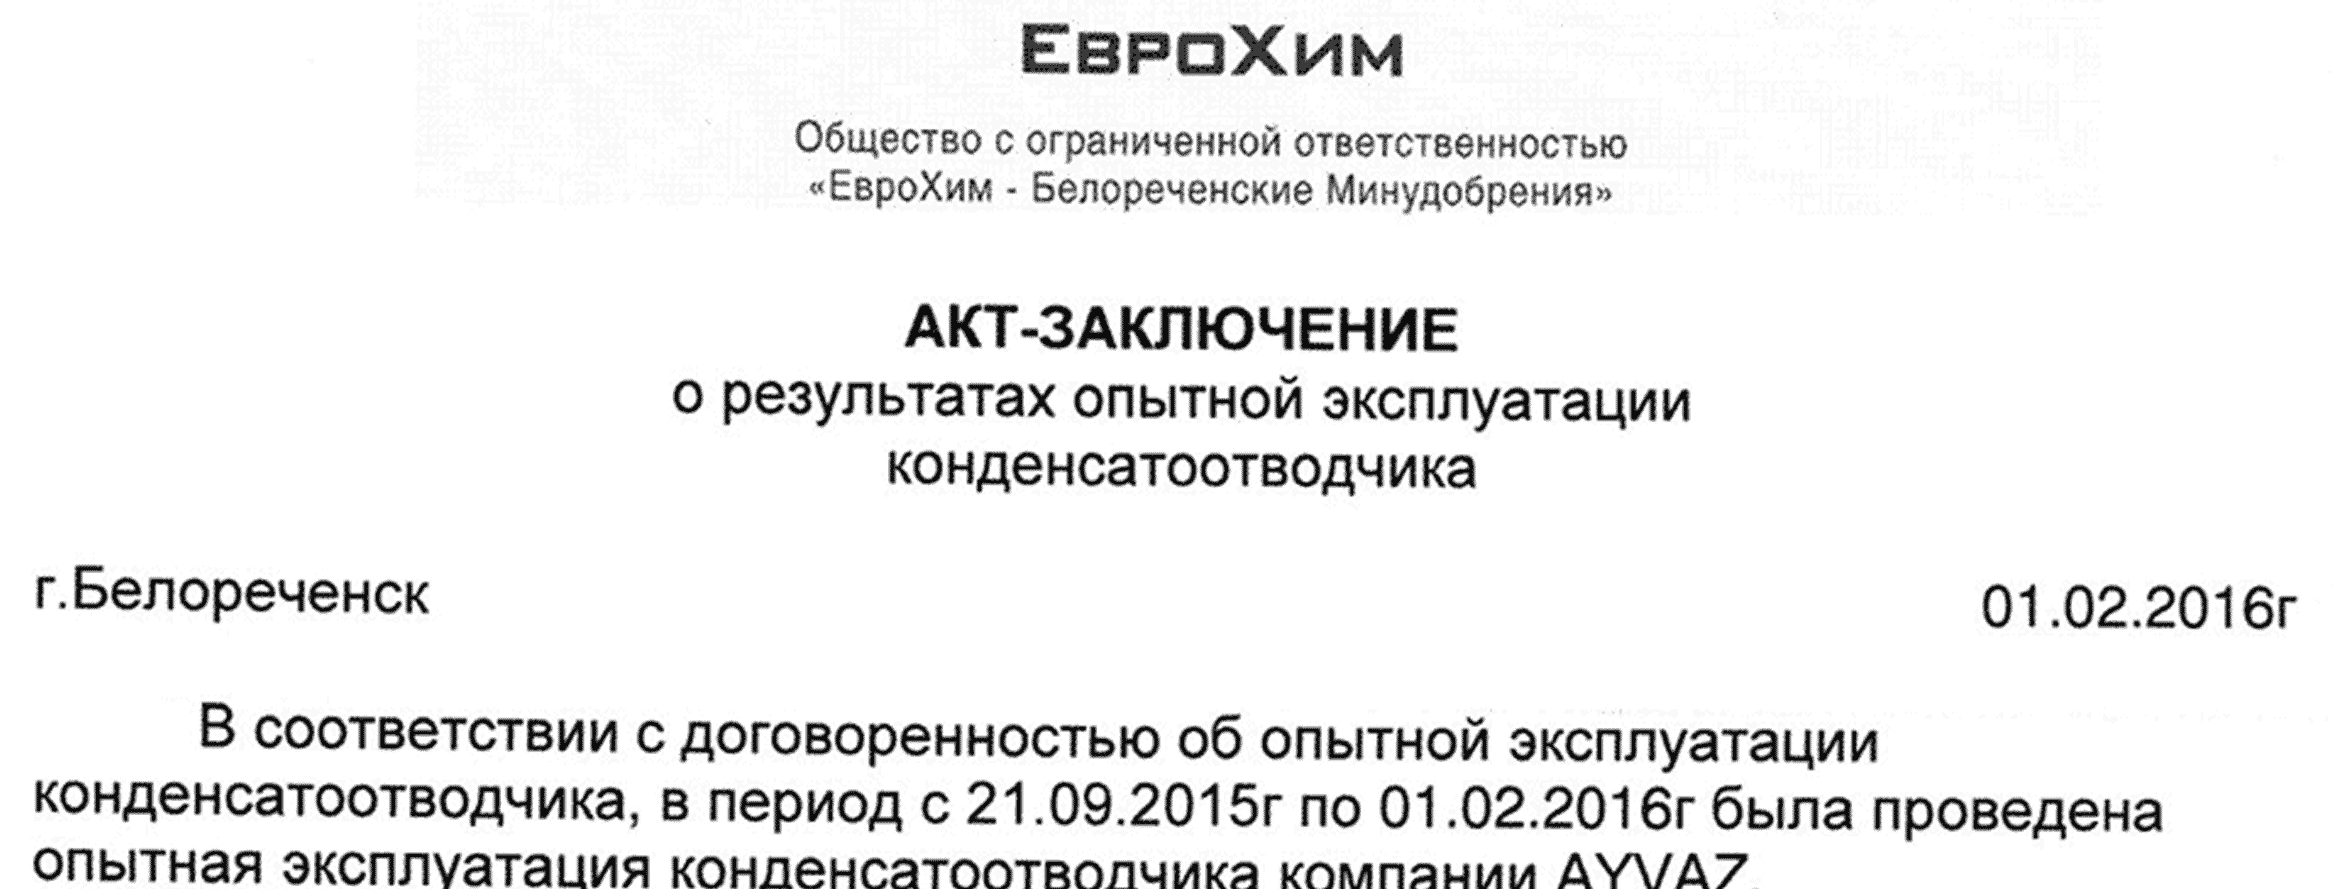 Акт испытаний конденсатоотводчика AYVAZ TKK-2Y миниатюра